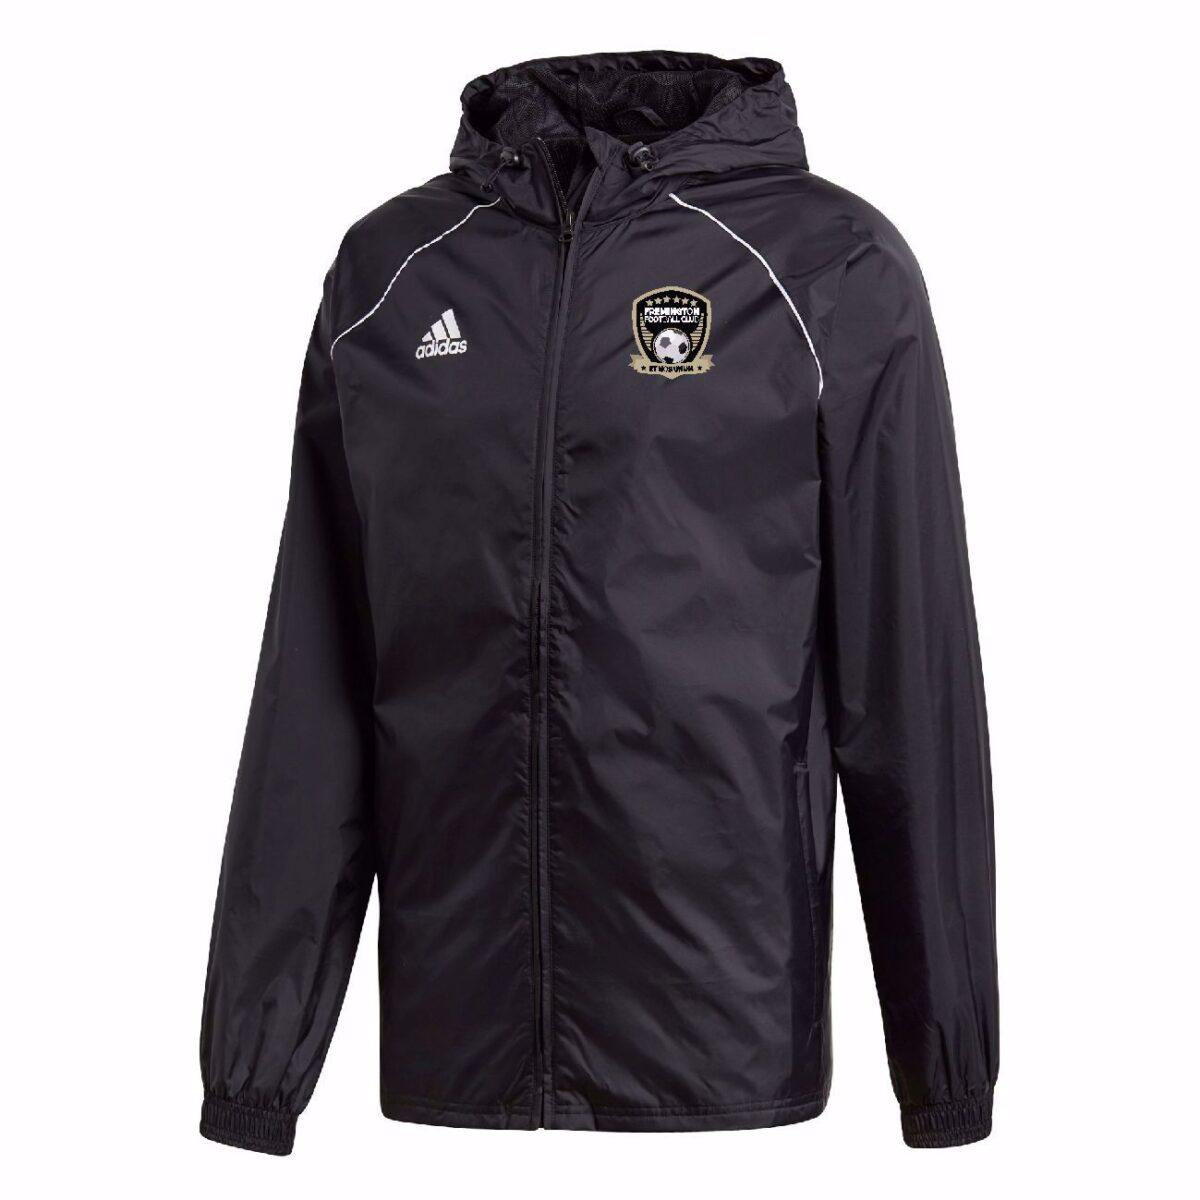 Fremington FC Adidas Core 18 Rain Jacket - ADULT